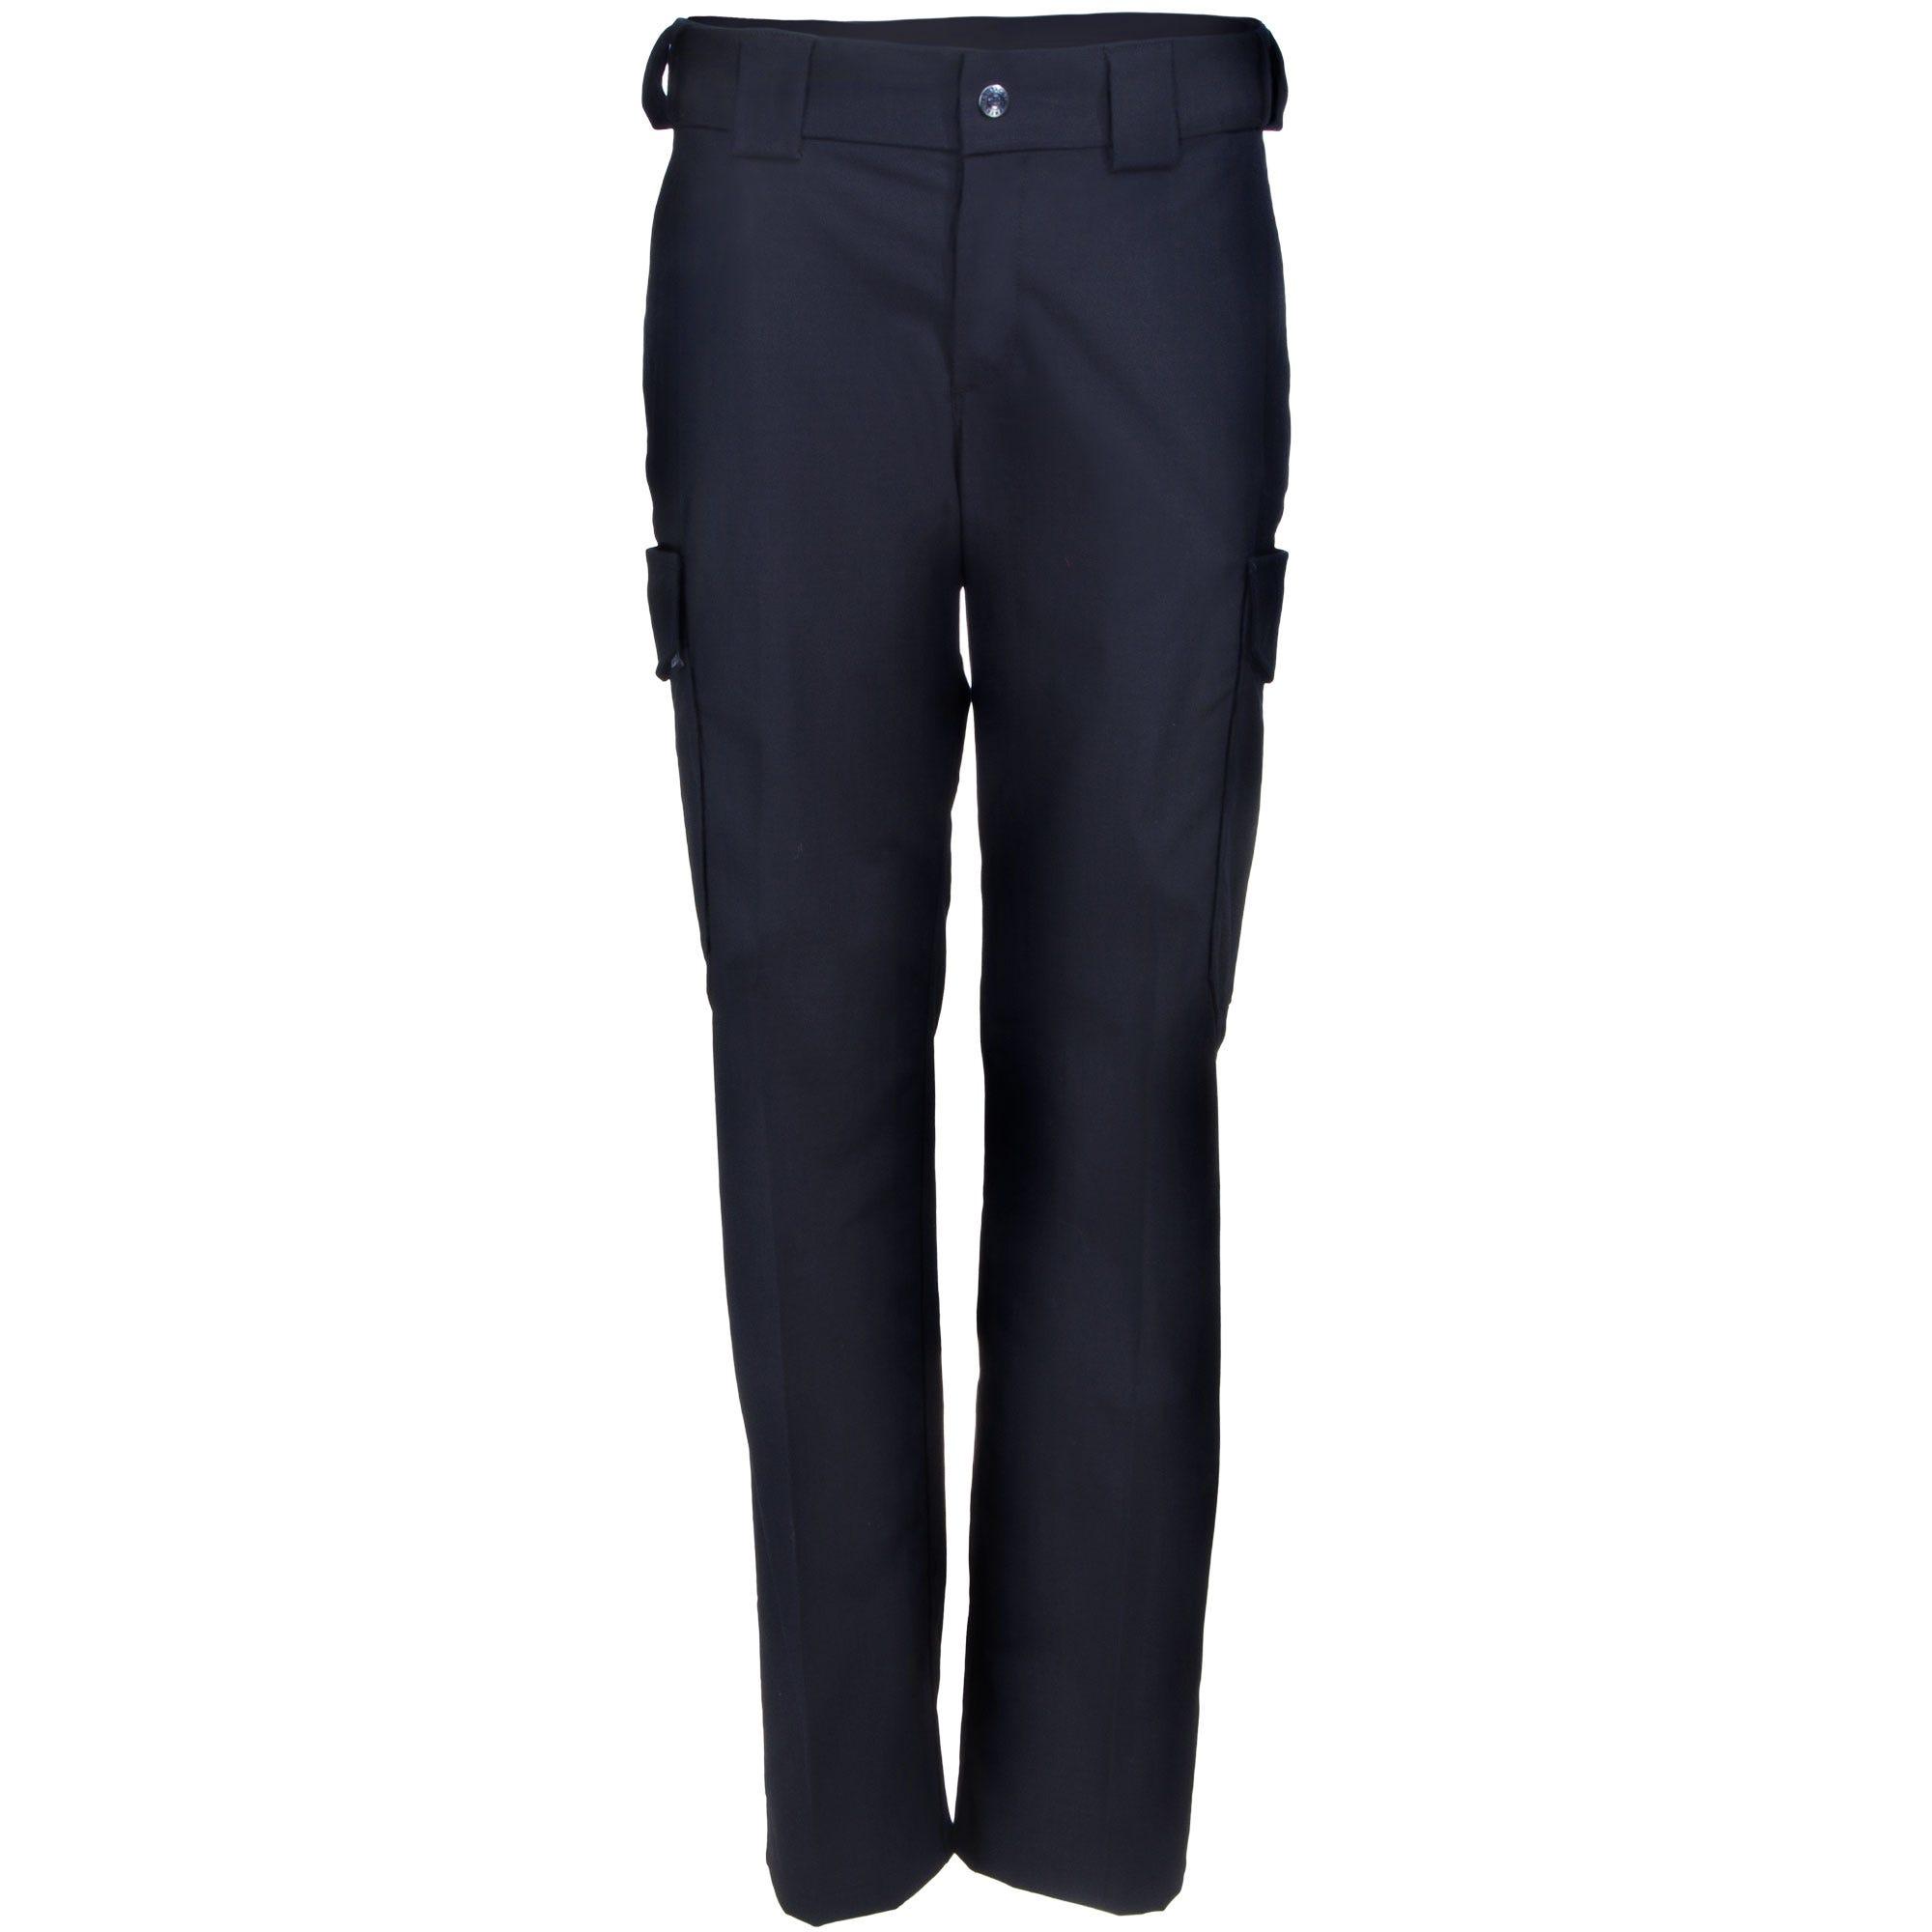 5.11 Tactical Women's 64306 750 Navy Twill Class B PDU Pants